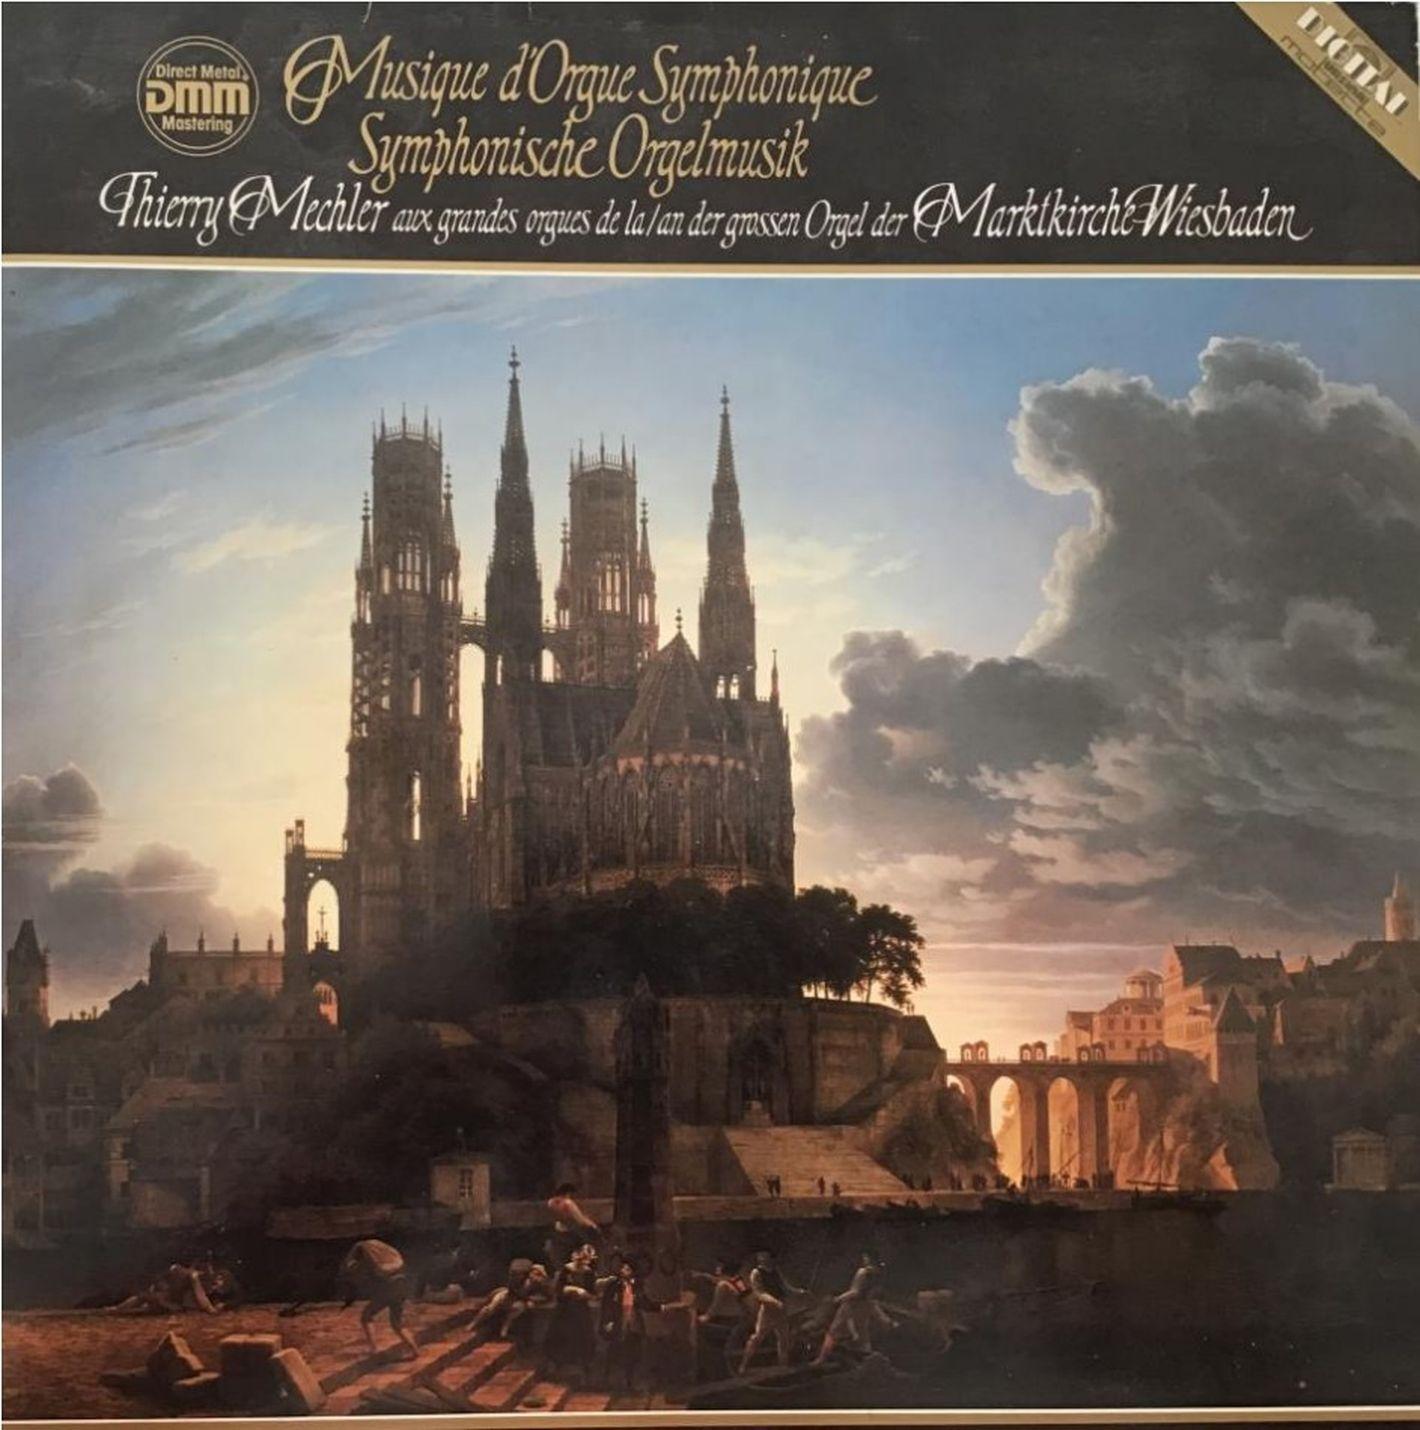 Symphonische Orgelmusik